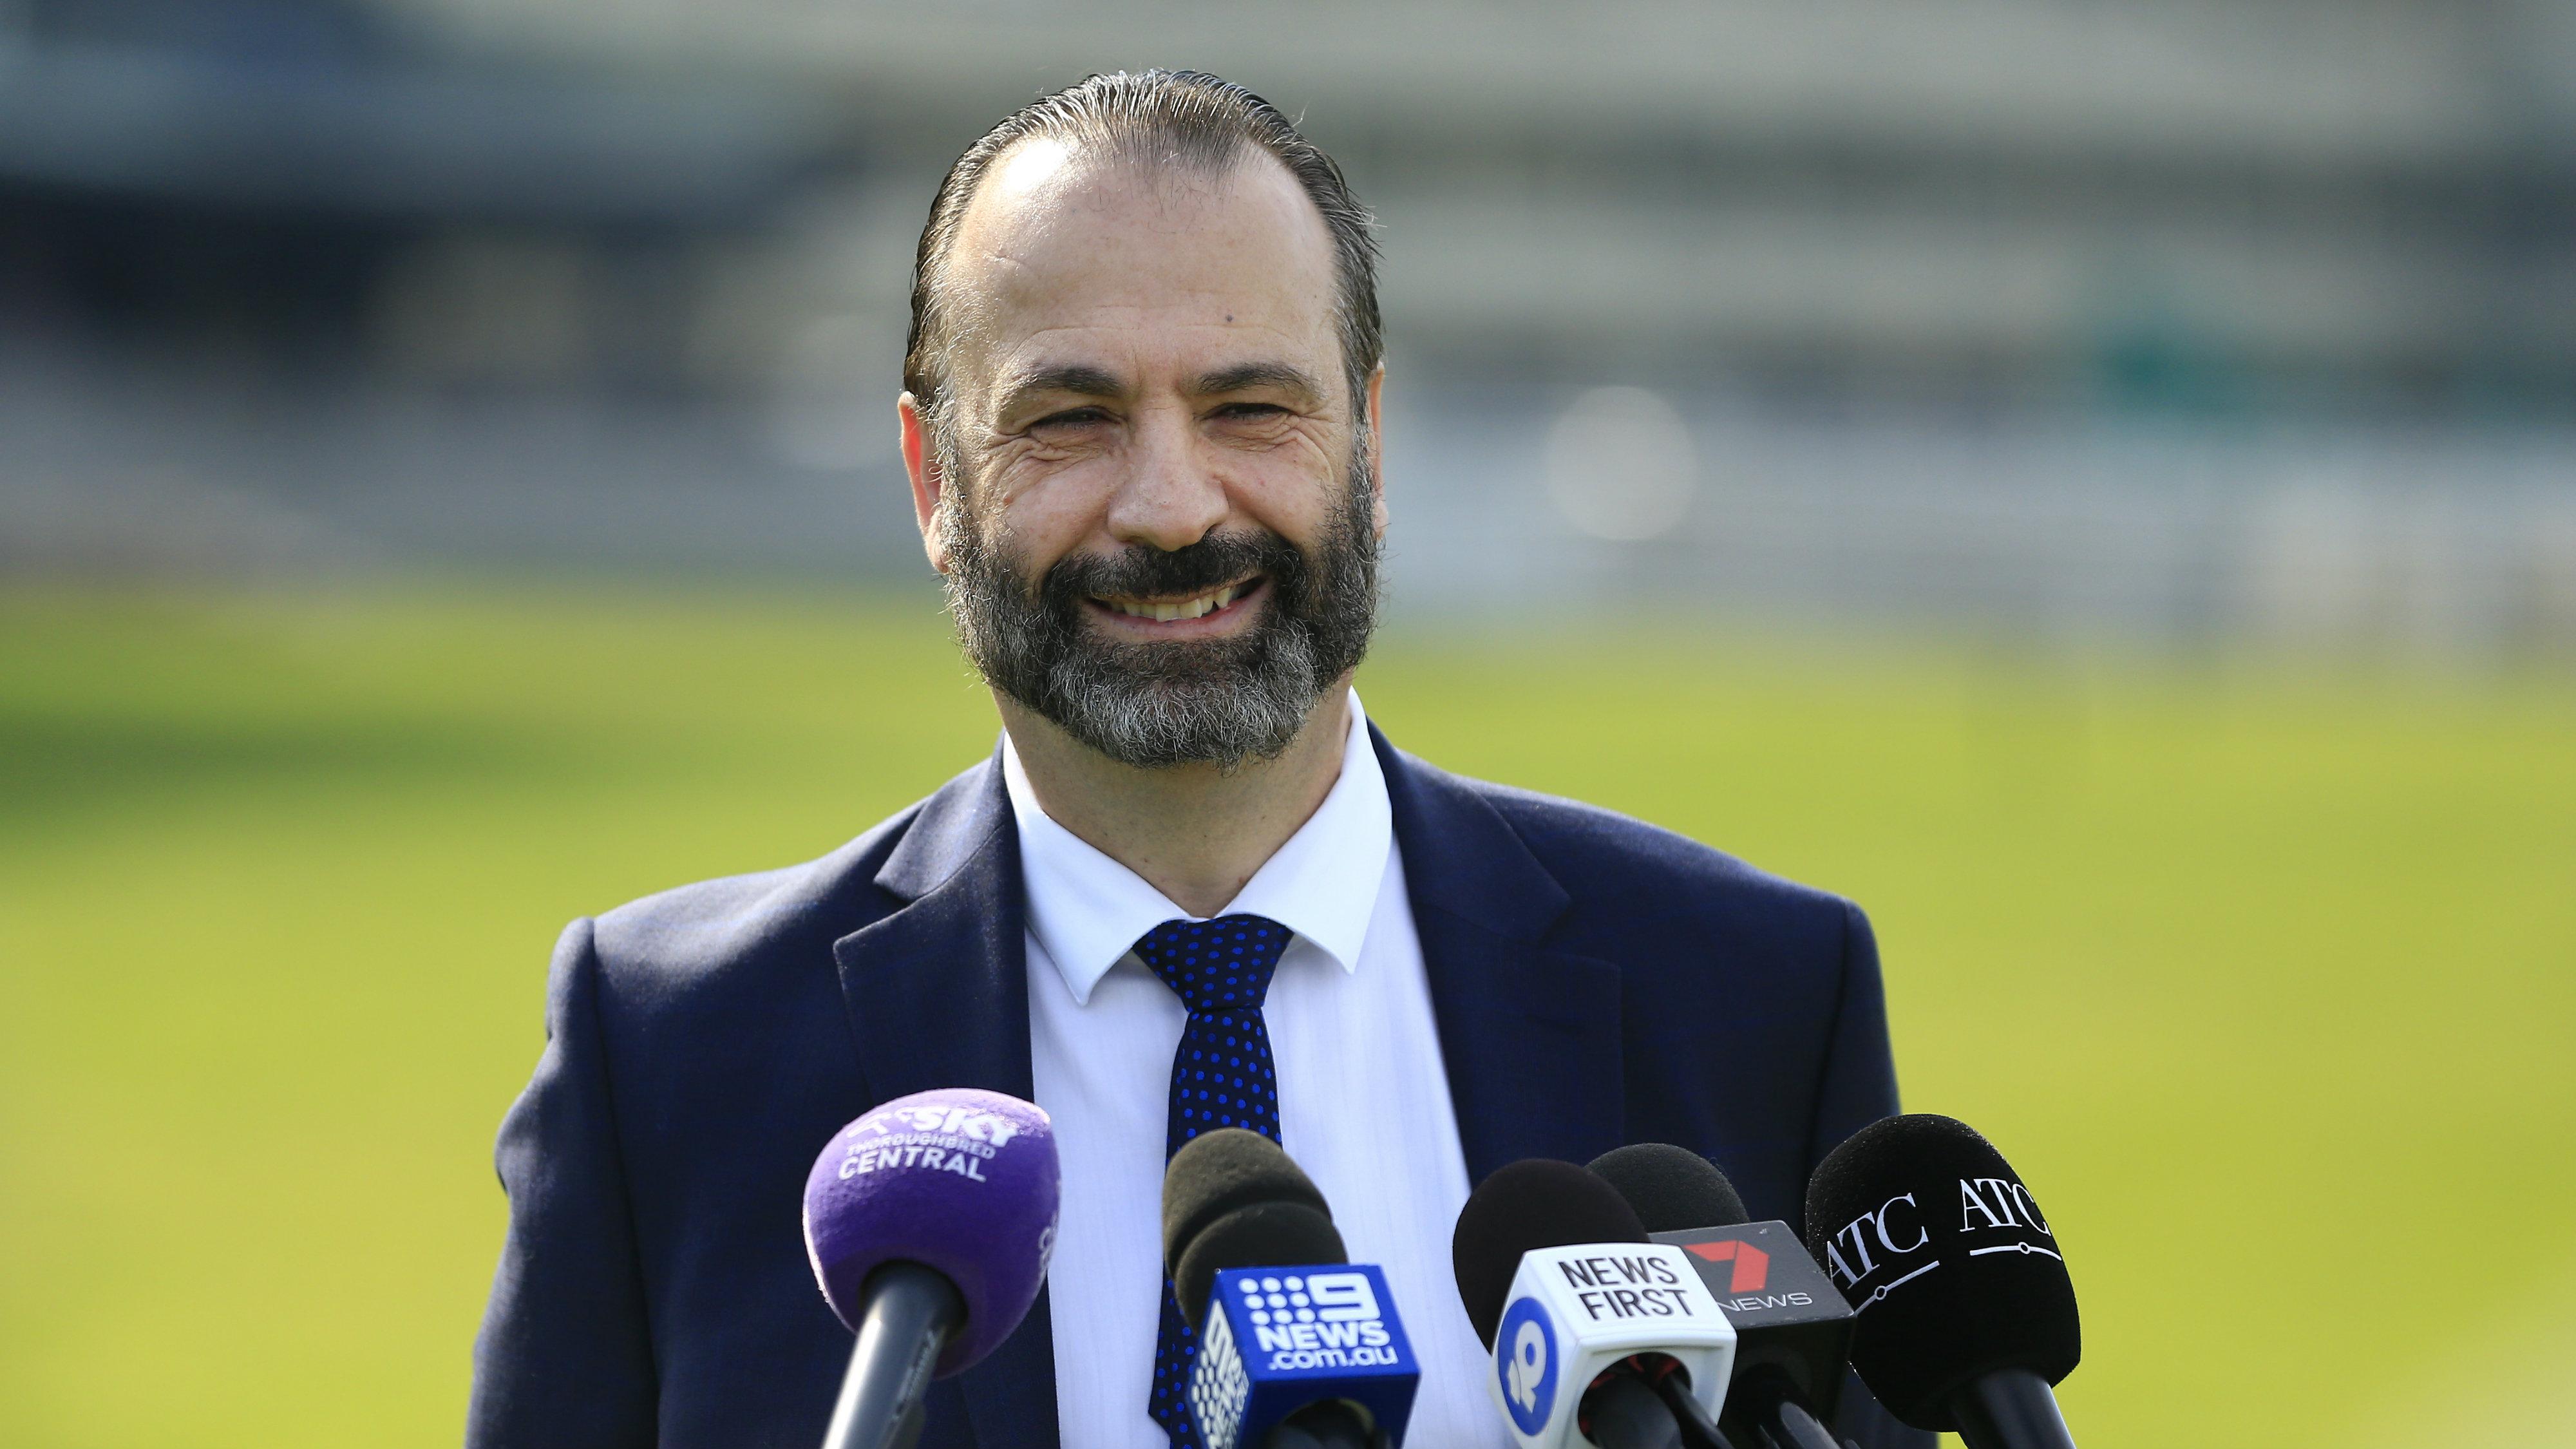 Melbourne Cup: Trainer and racing expert Richard Freedman explains Peter V'landys comments about moving big race